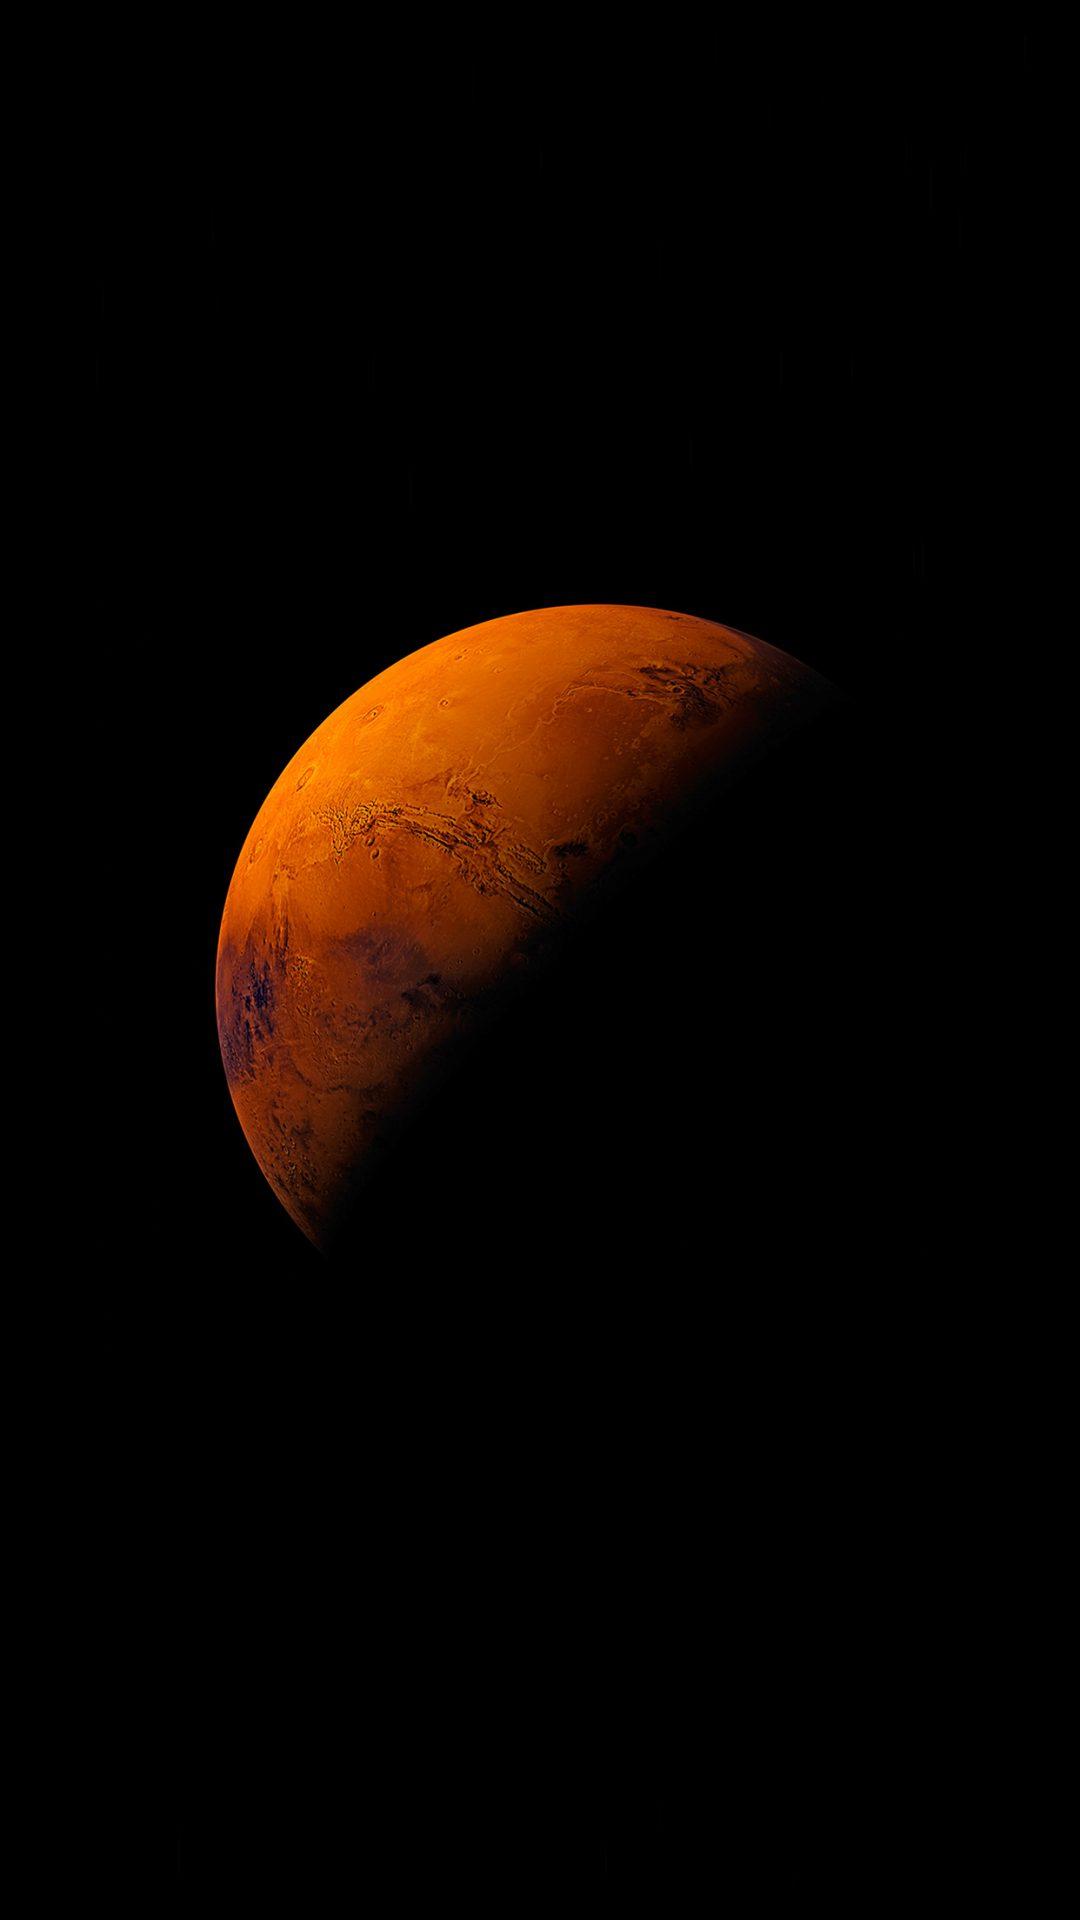 Mars Planet Apple Dark Space Orange